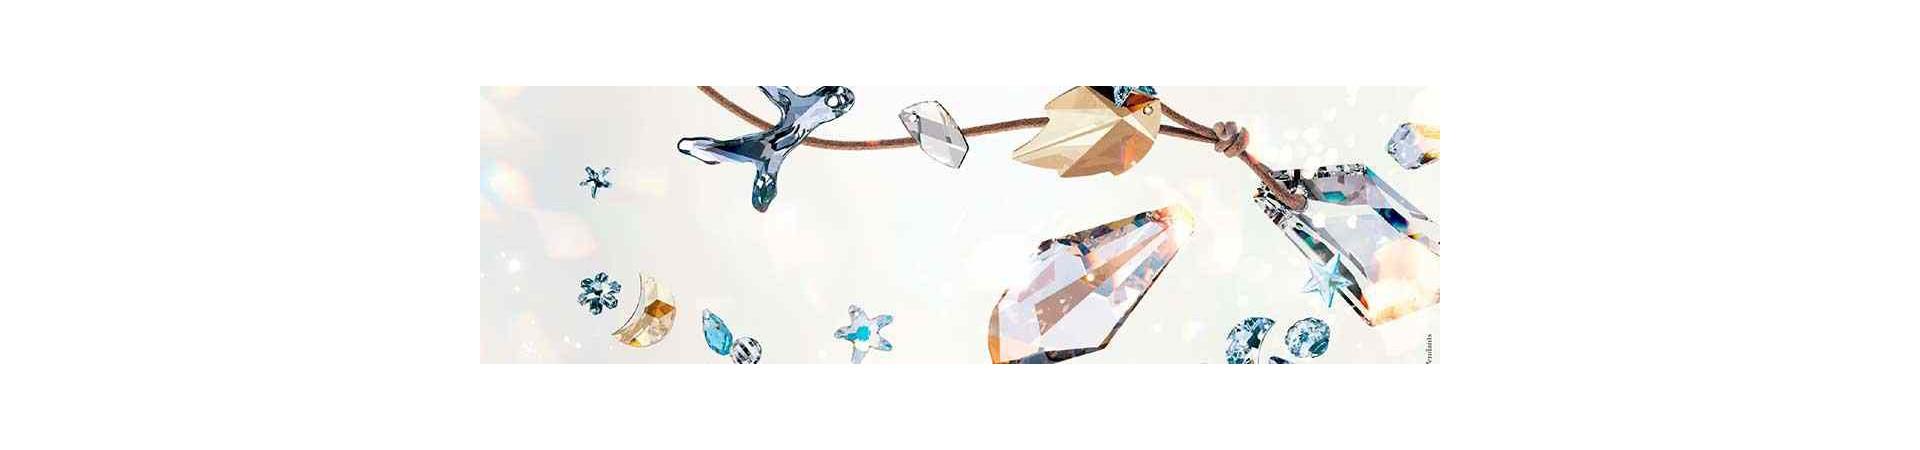 Pendentifs en cristal